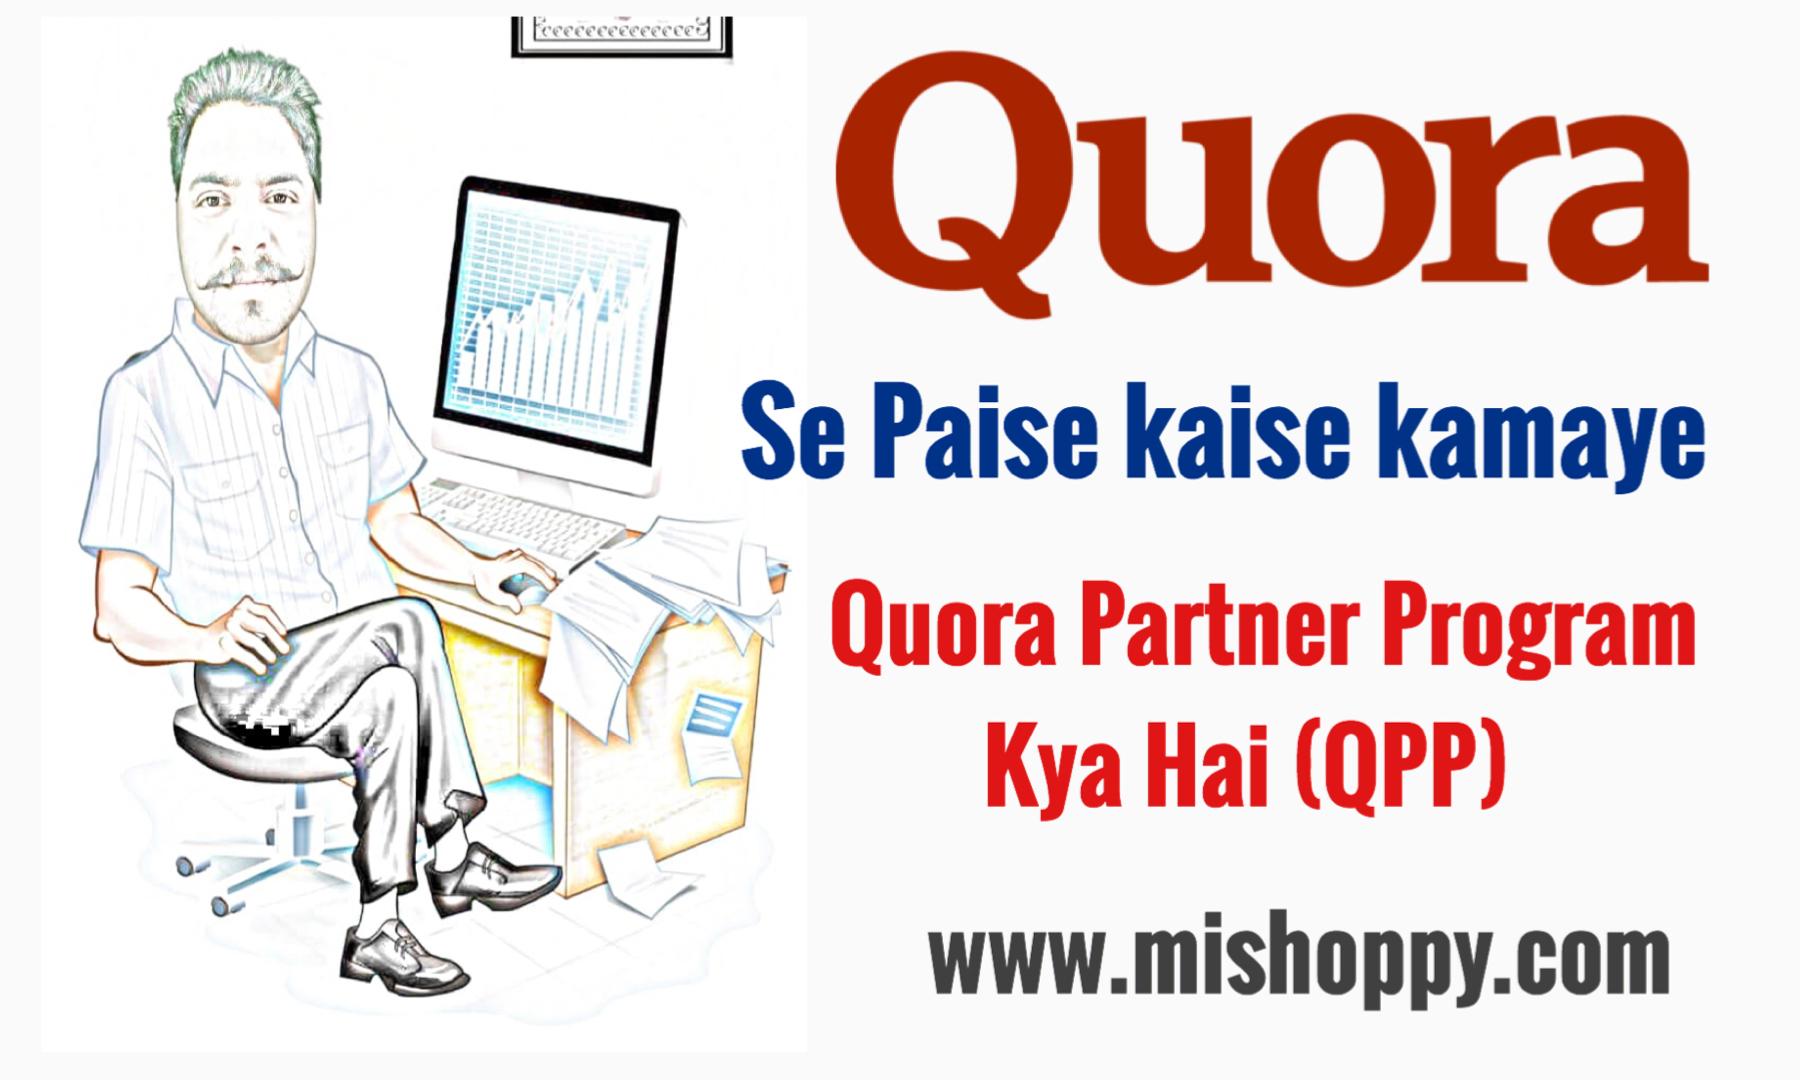 Quora Partner Program Kya Hai (QPP) और इससे पैसे कैसे कमाए, How to Earn Money from Quora Partner Program in Hindi, Quora Kya hai, quora app